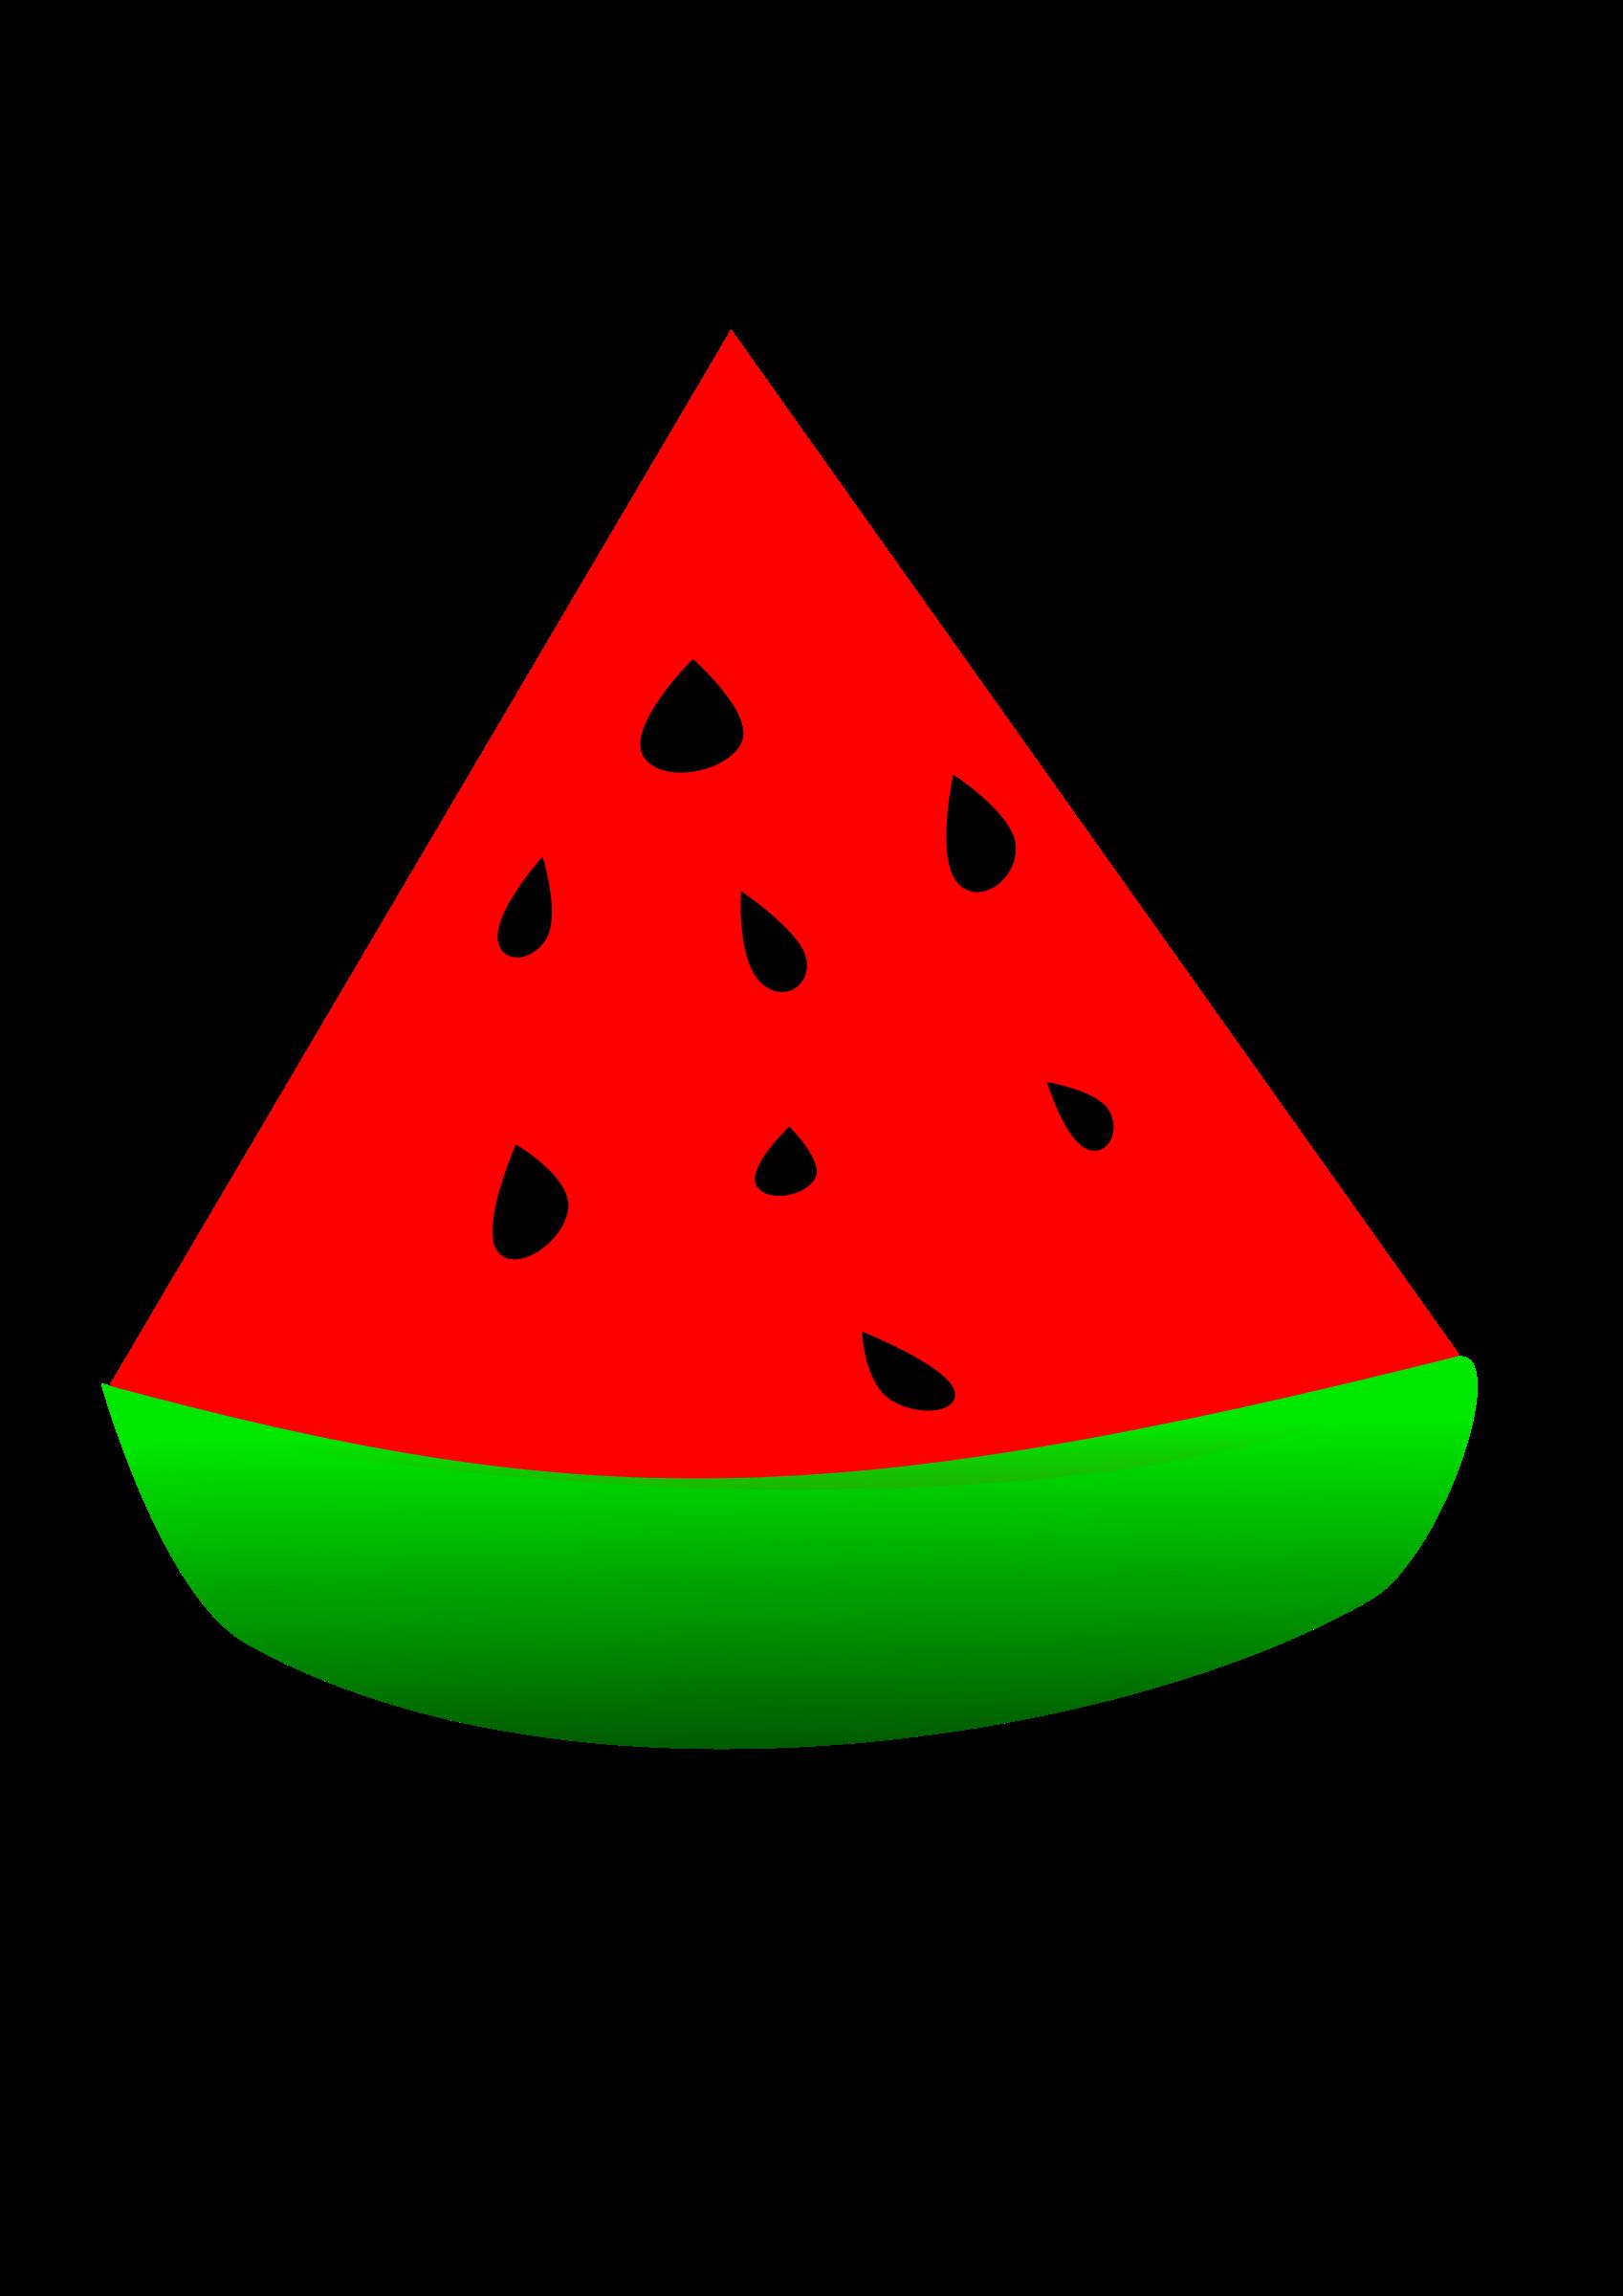 Watermelon clipart sandia. Big image png